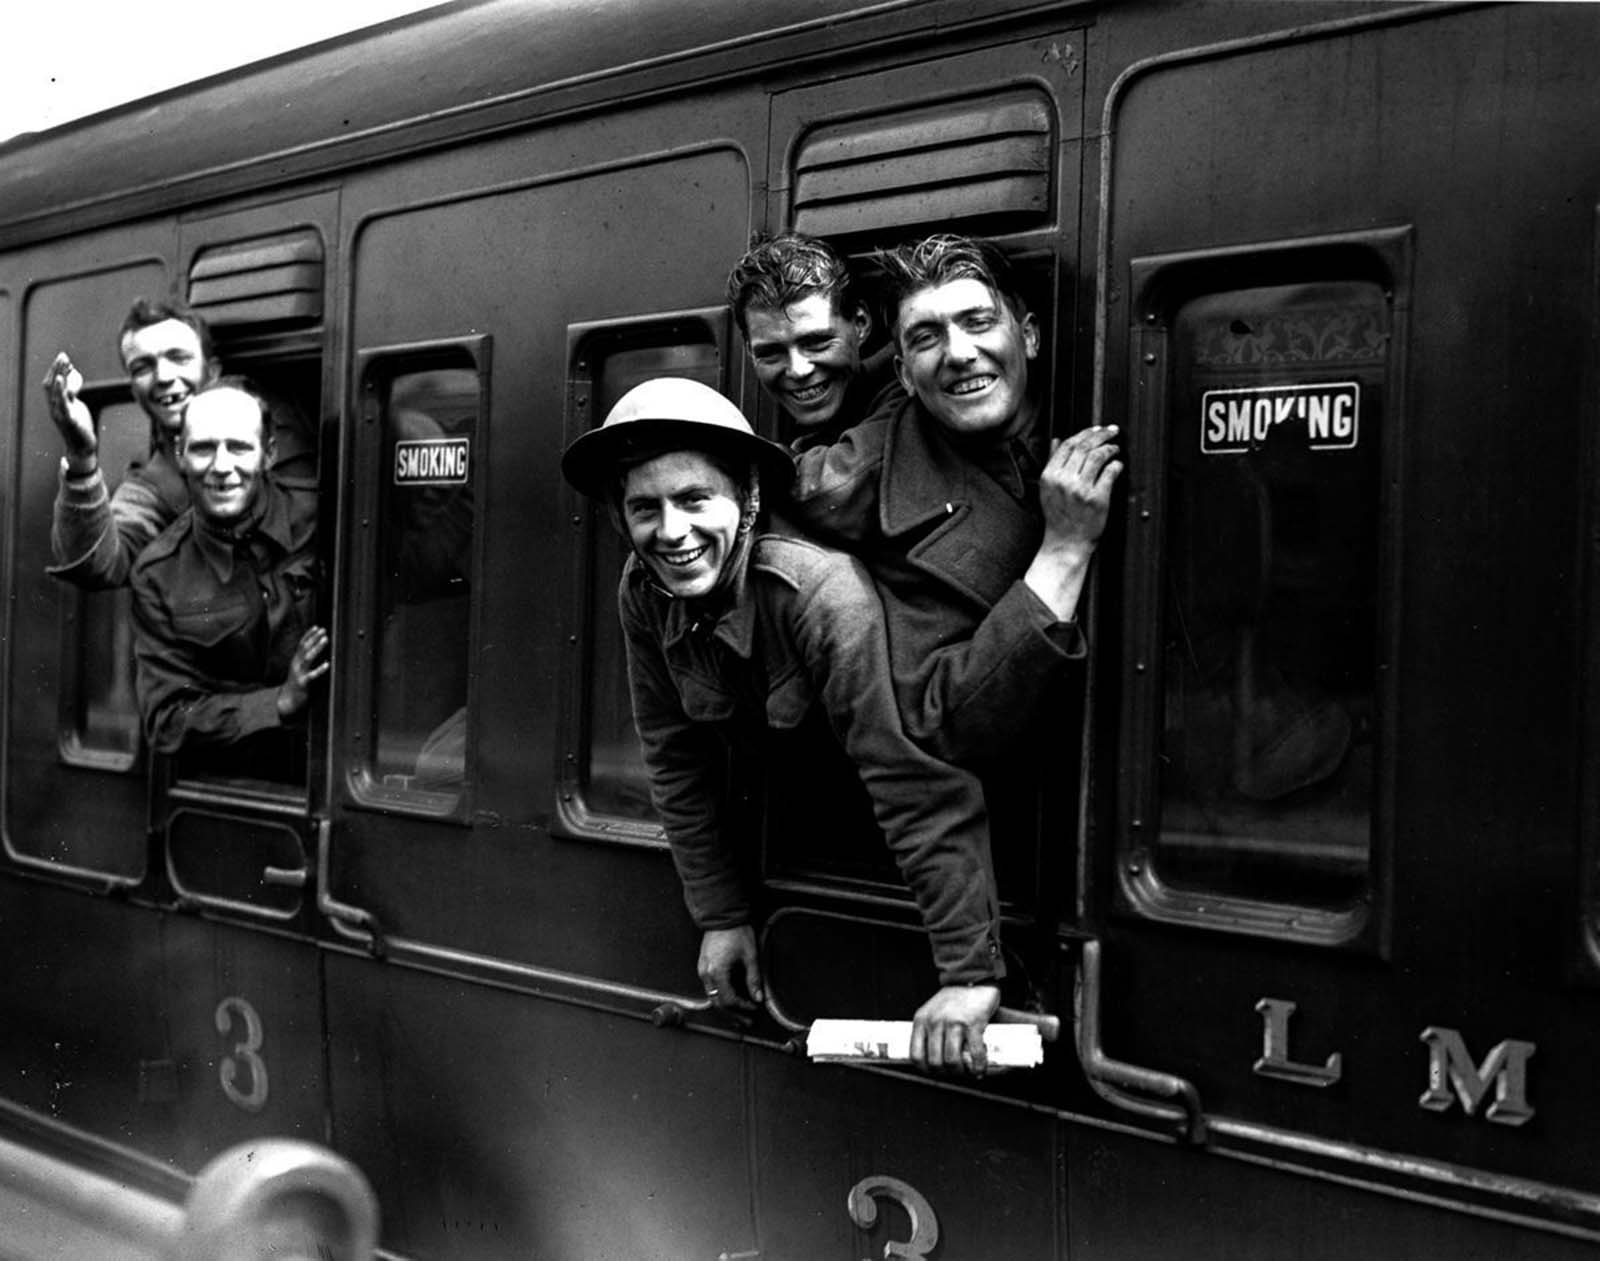 British troops arrive safely back in London.